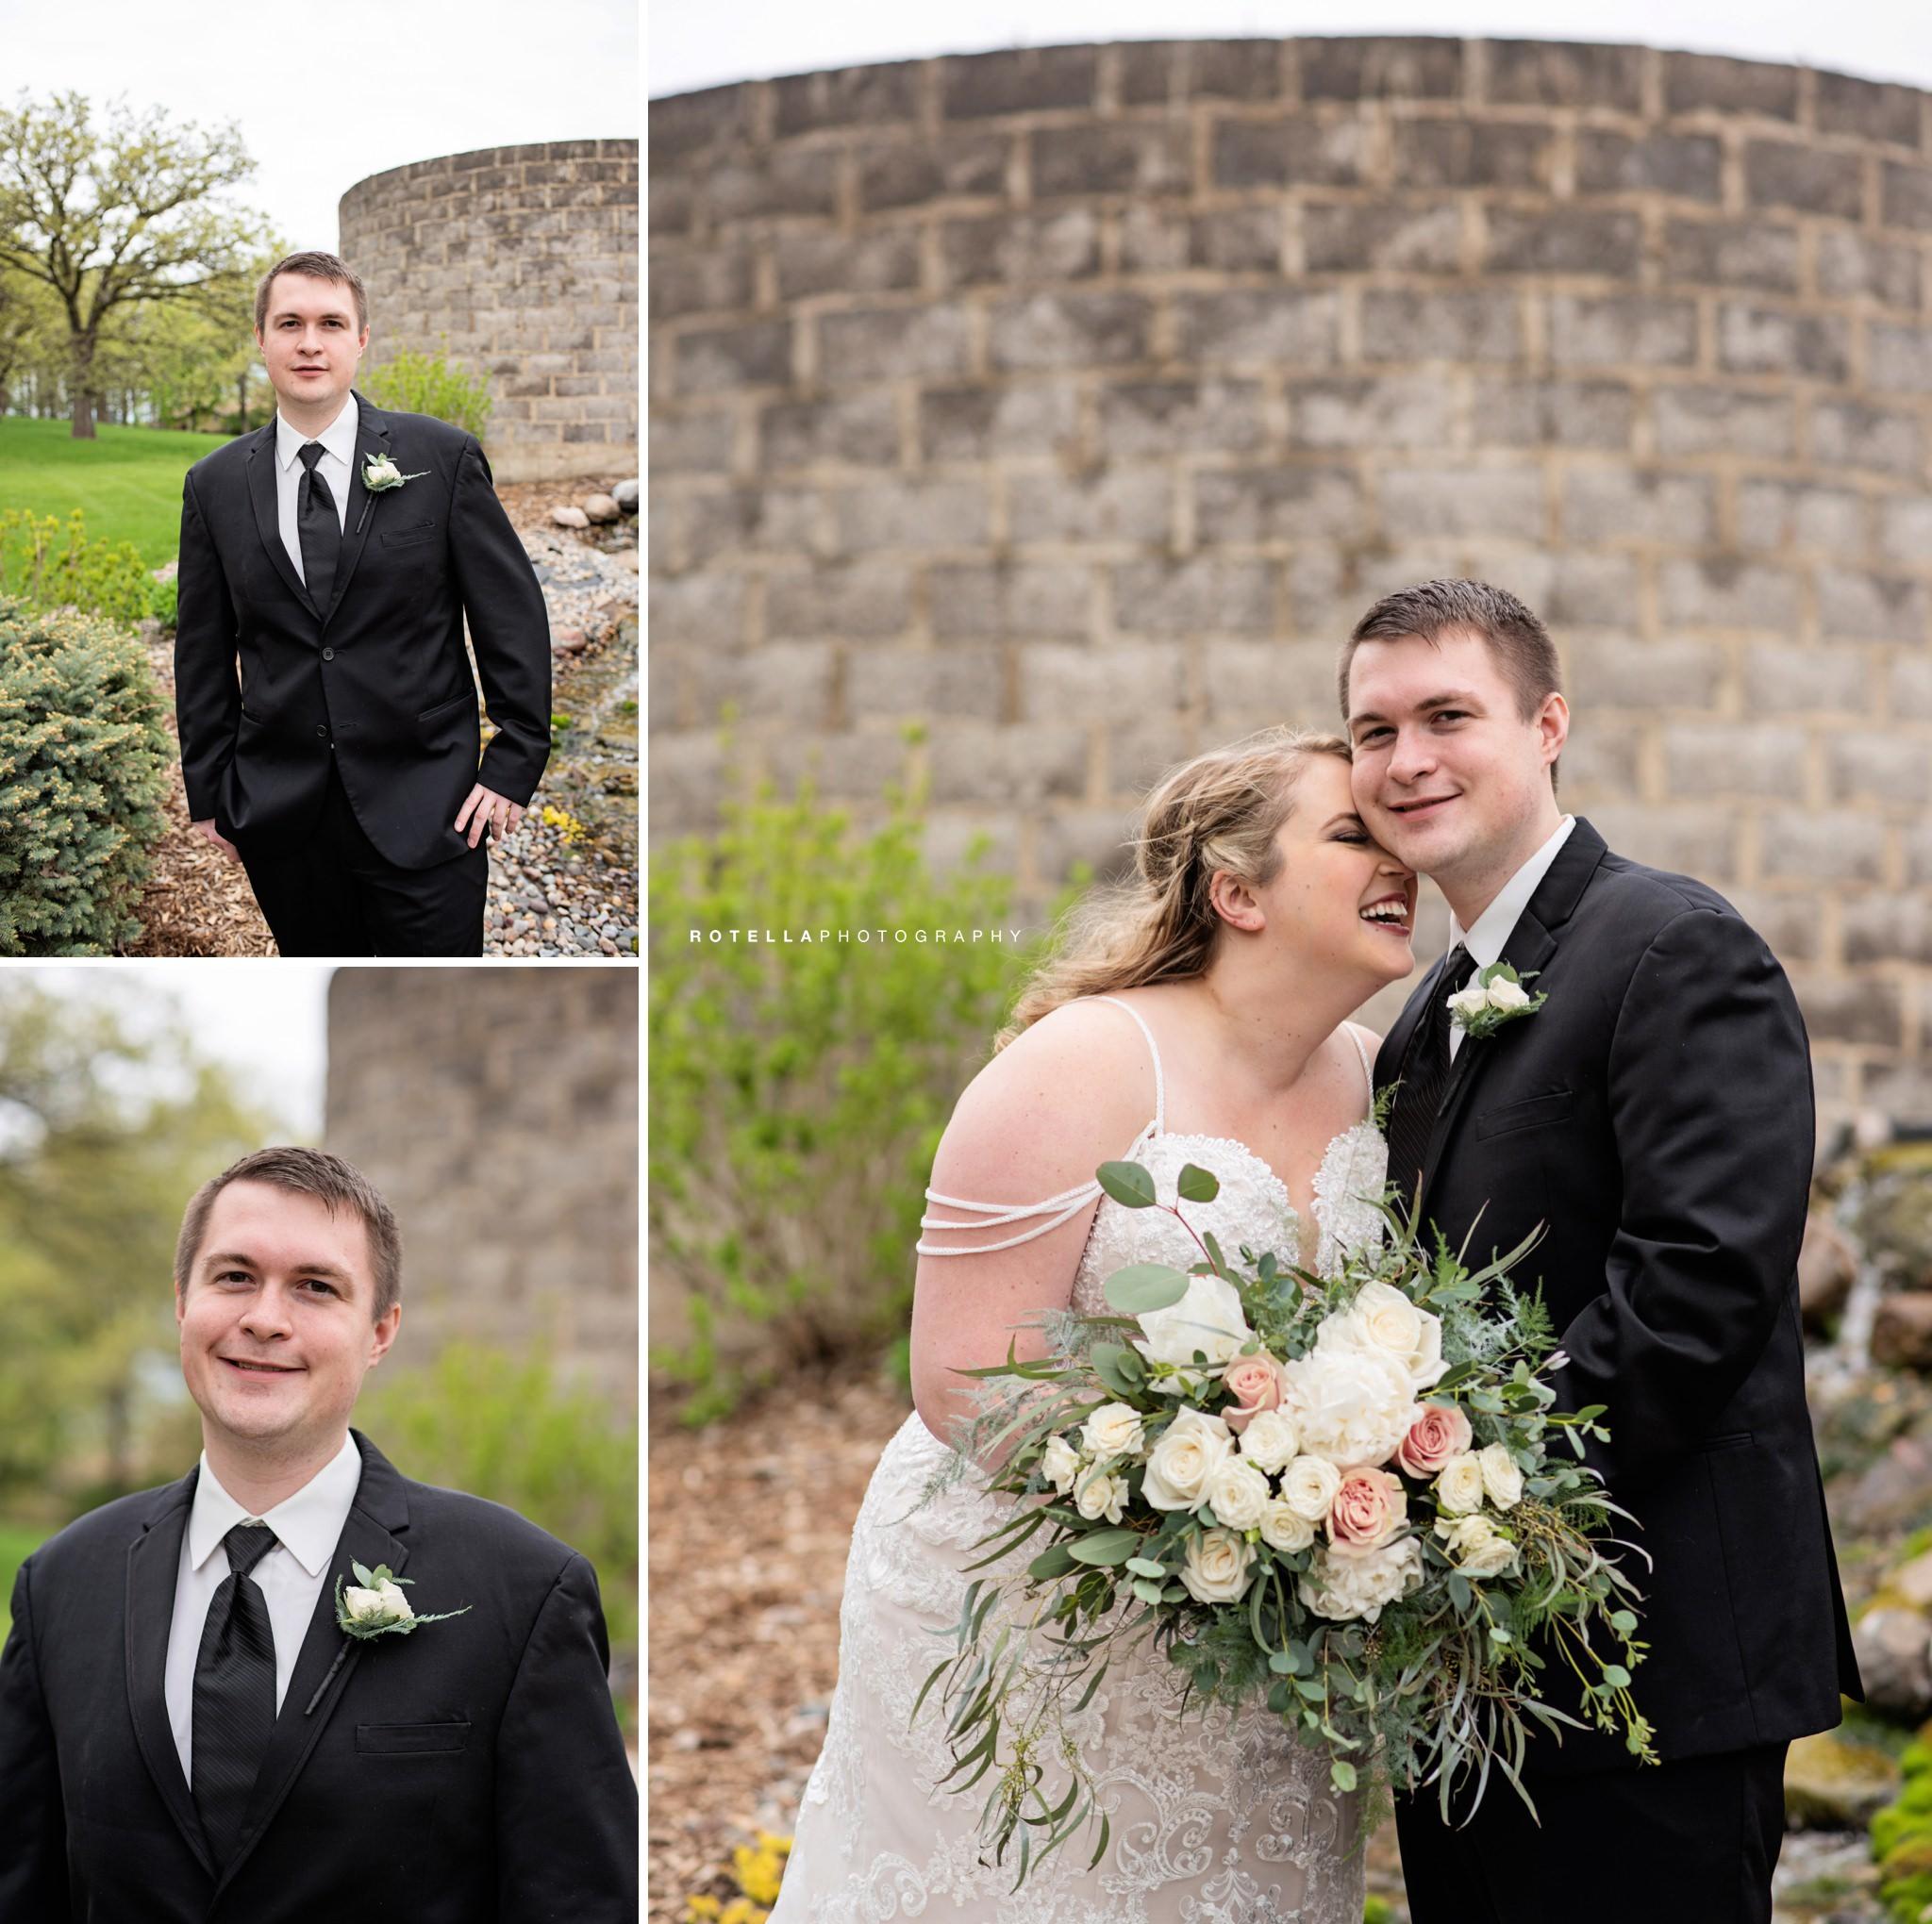 Cassie-Corbin-Wedding-05-25-2019-Rotella-Photography-PREV-97-315_BLOG.jpg